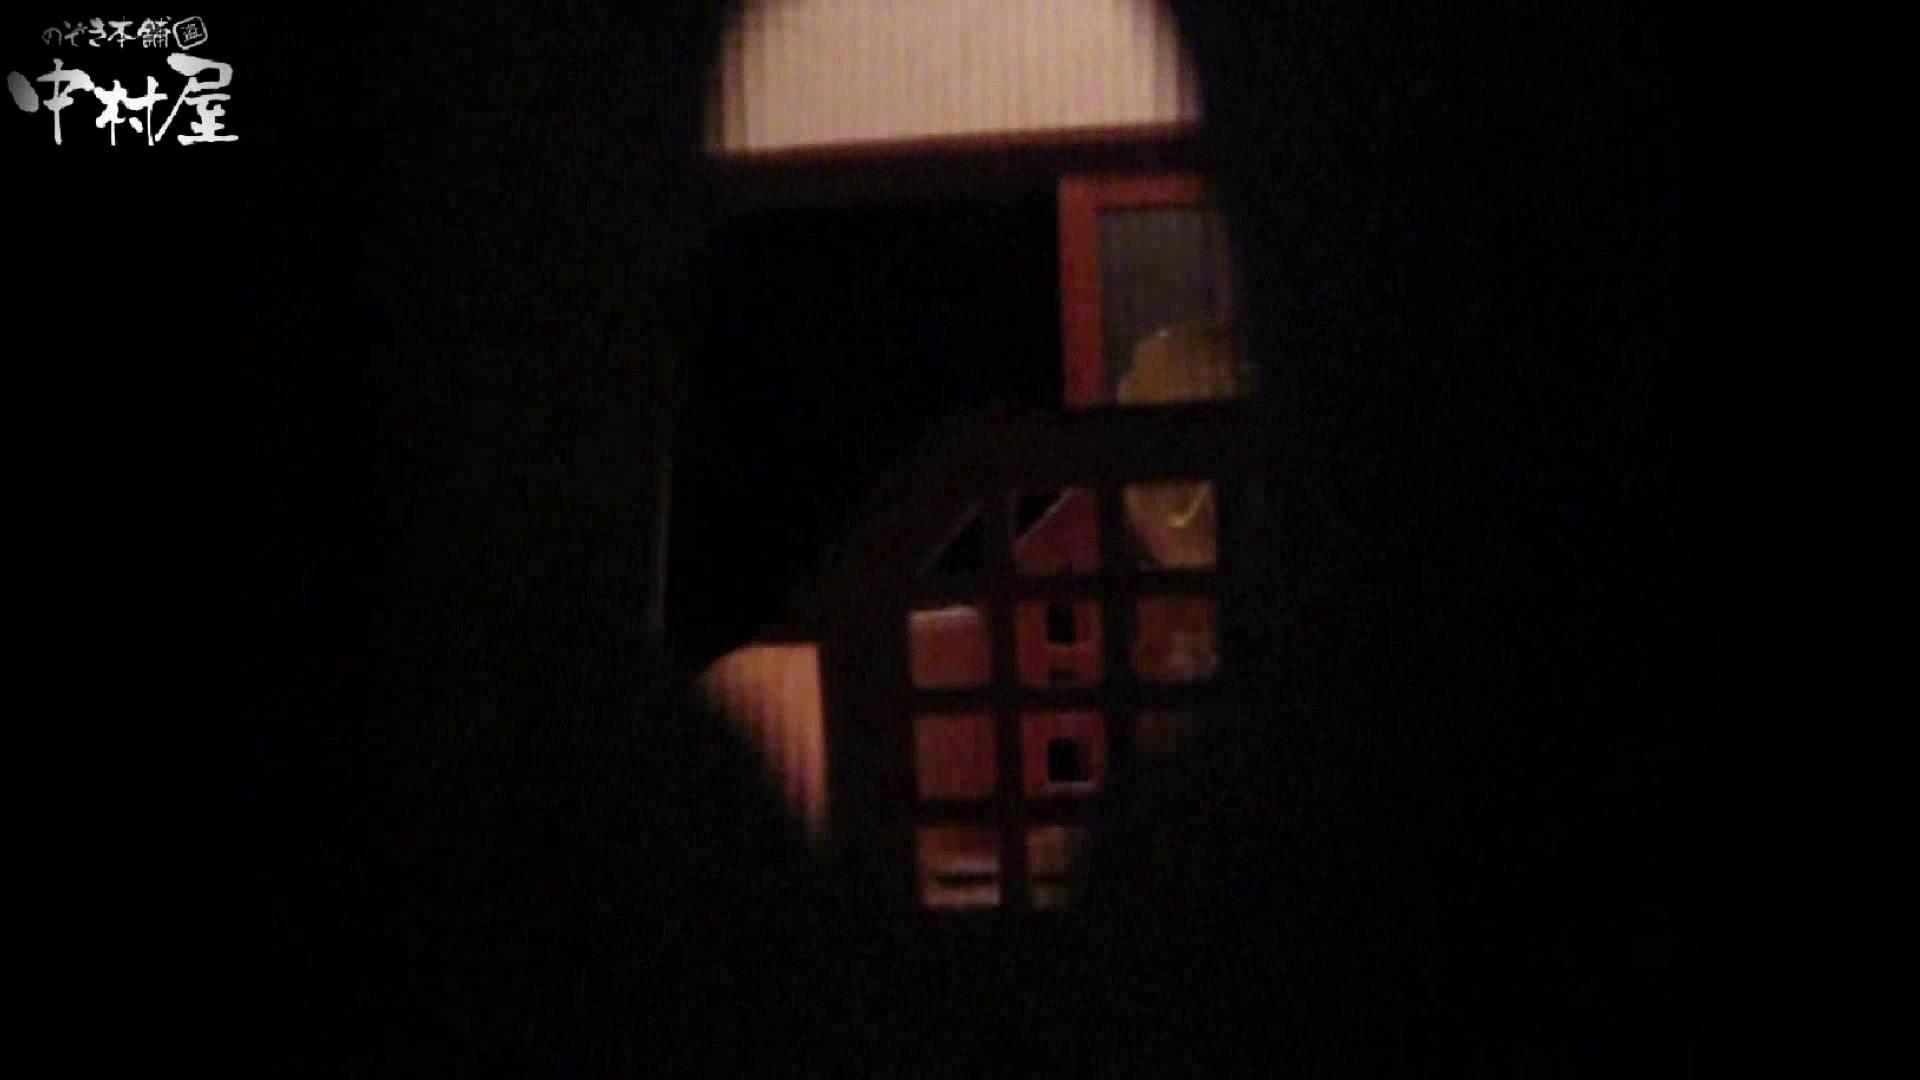 民家風呂専門盗撮師の超危険映像 vol.020 盗撮シリーズ オマンコ無修正動画無料 93PIX 27